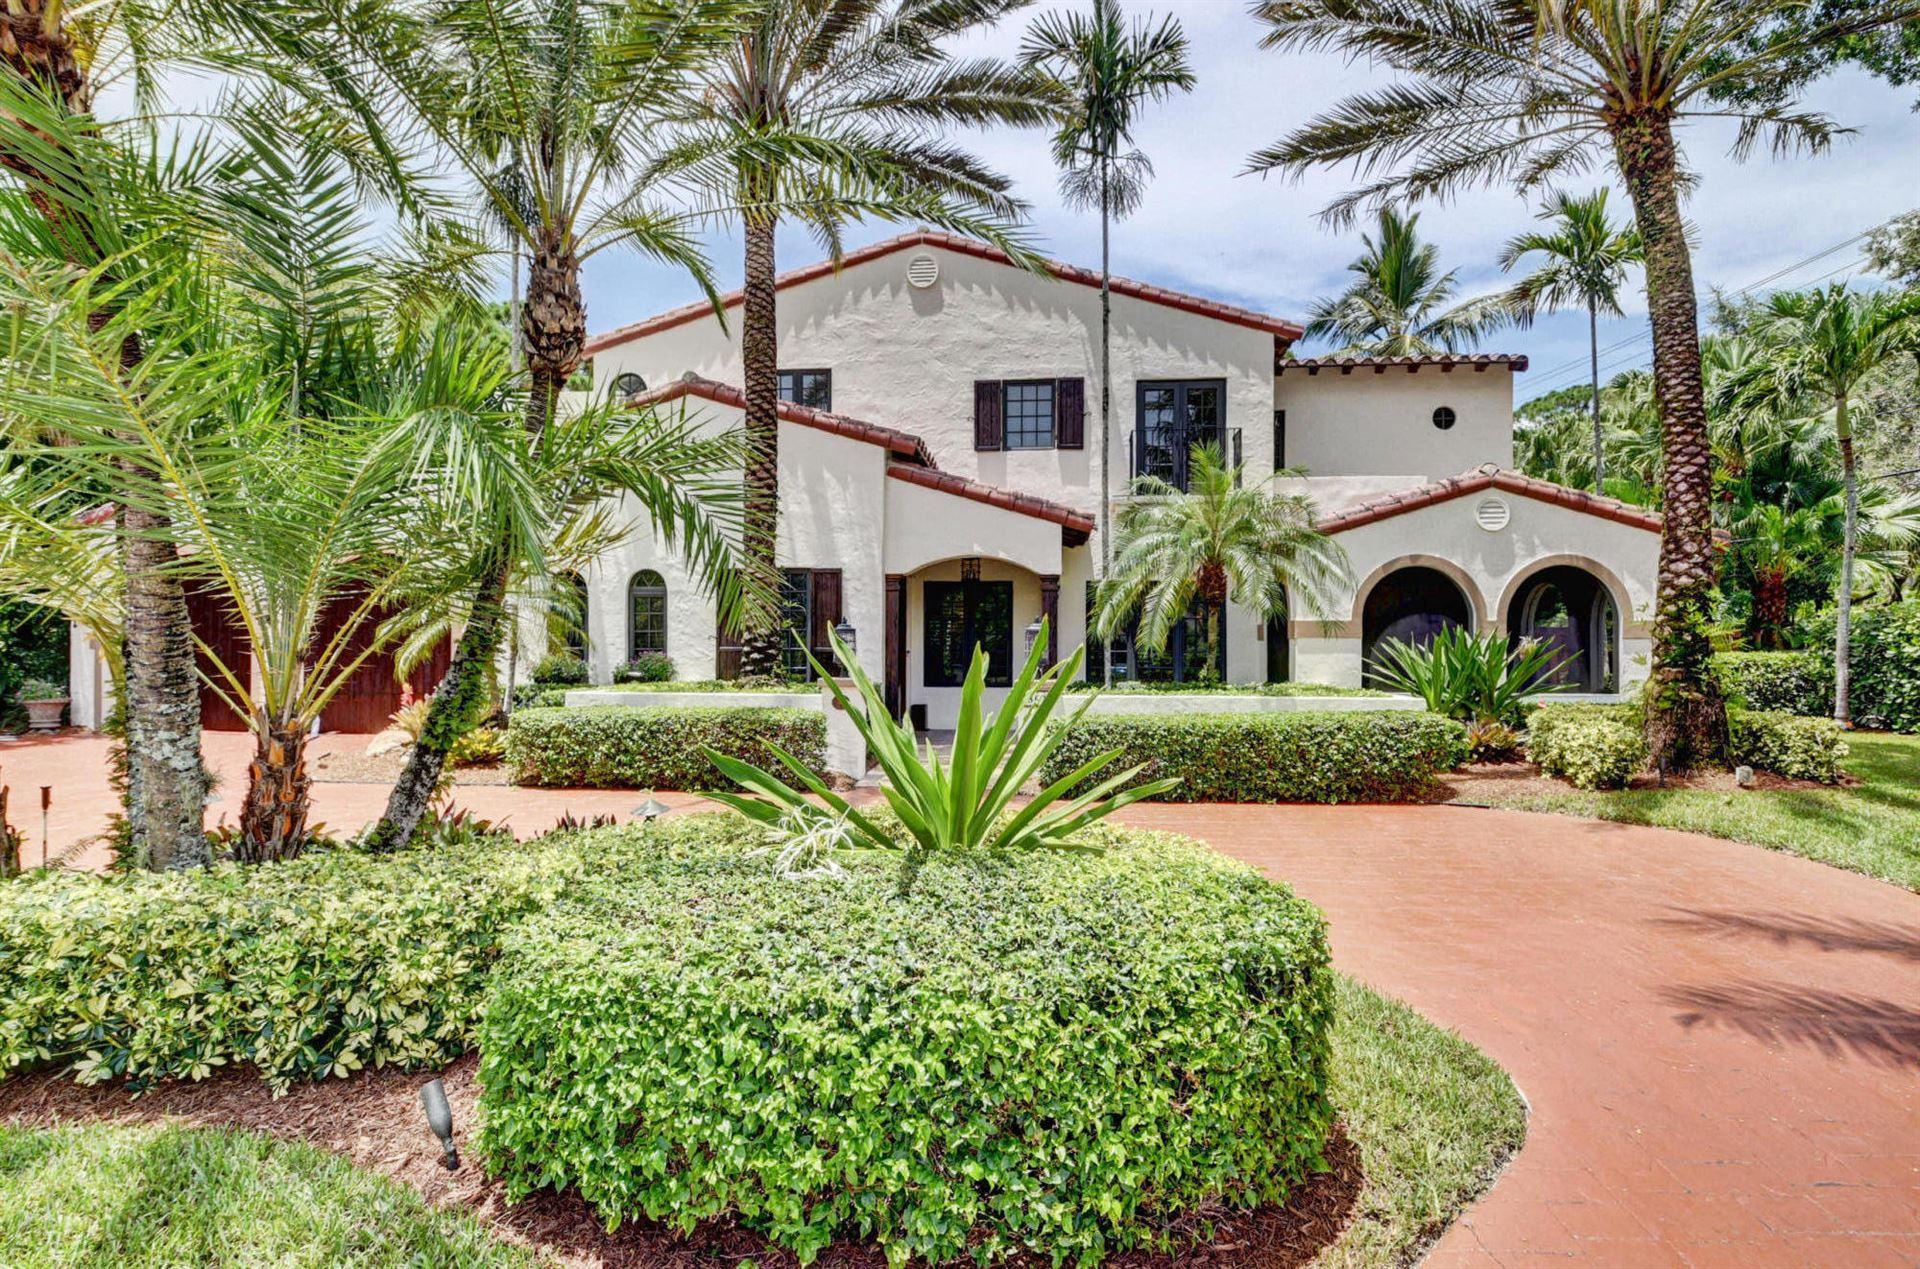 801 Azalea Street, Boca Raton, FL 33486 - #: RX-10617572